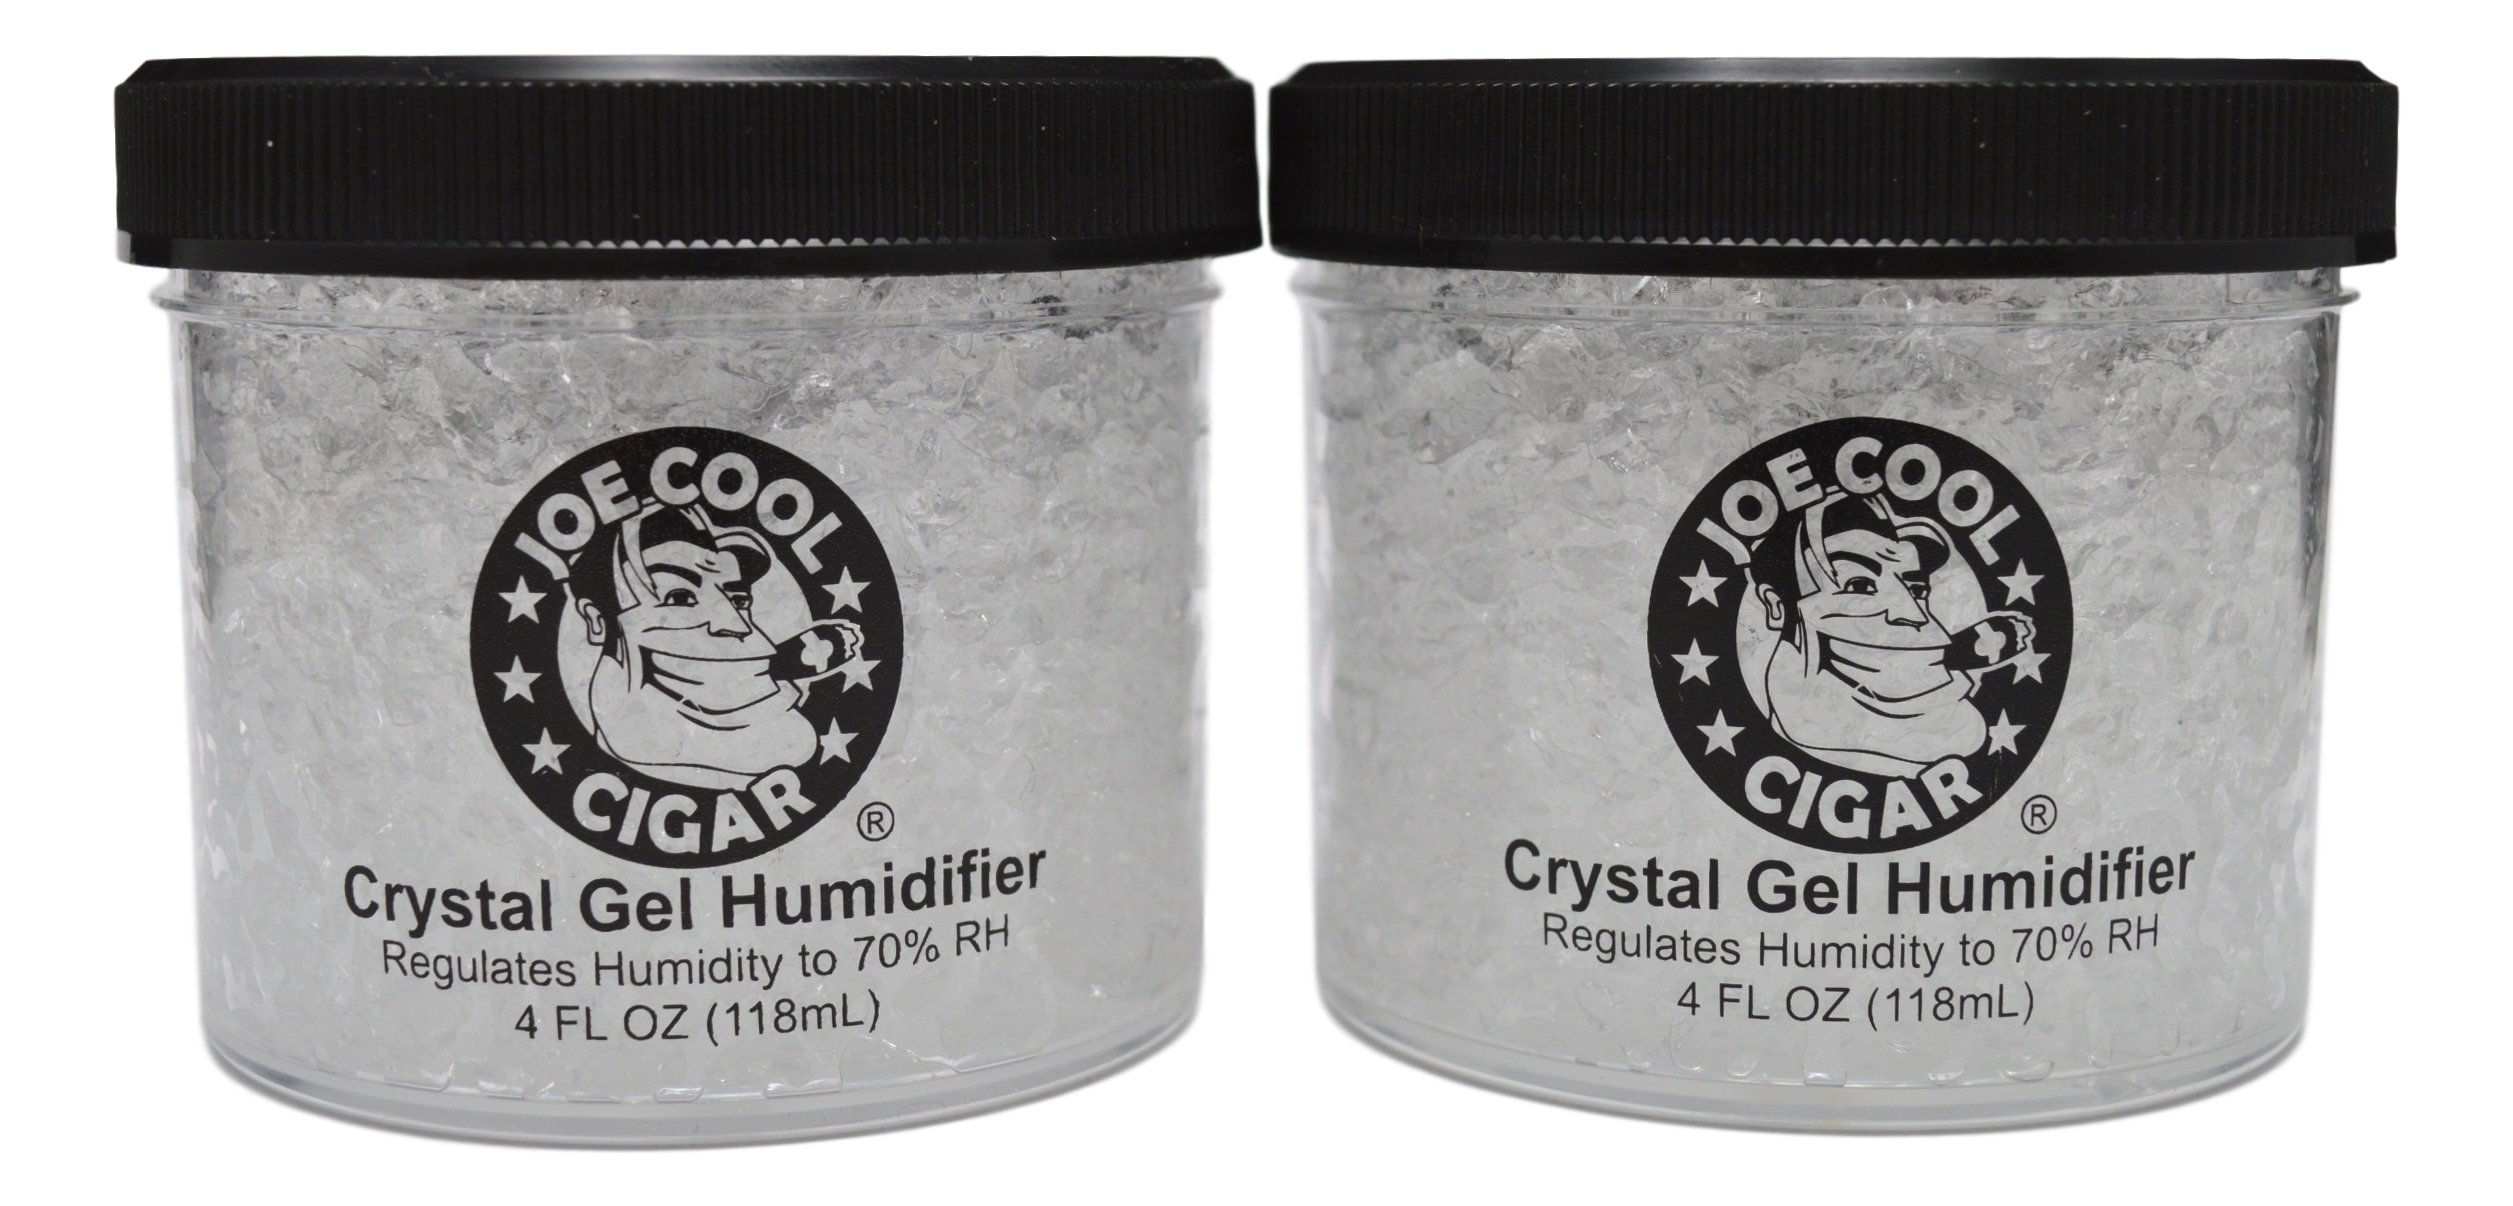 Joe Cool Cigar Crystal Gel Humidifier for Cigar Humidors (4 oz Jars) - 2 Pack by Joe Cool Cigar